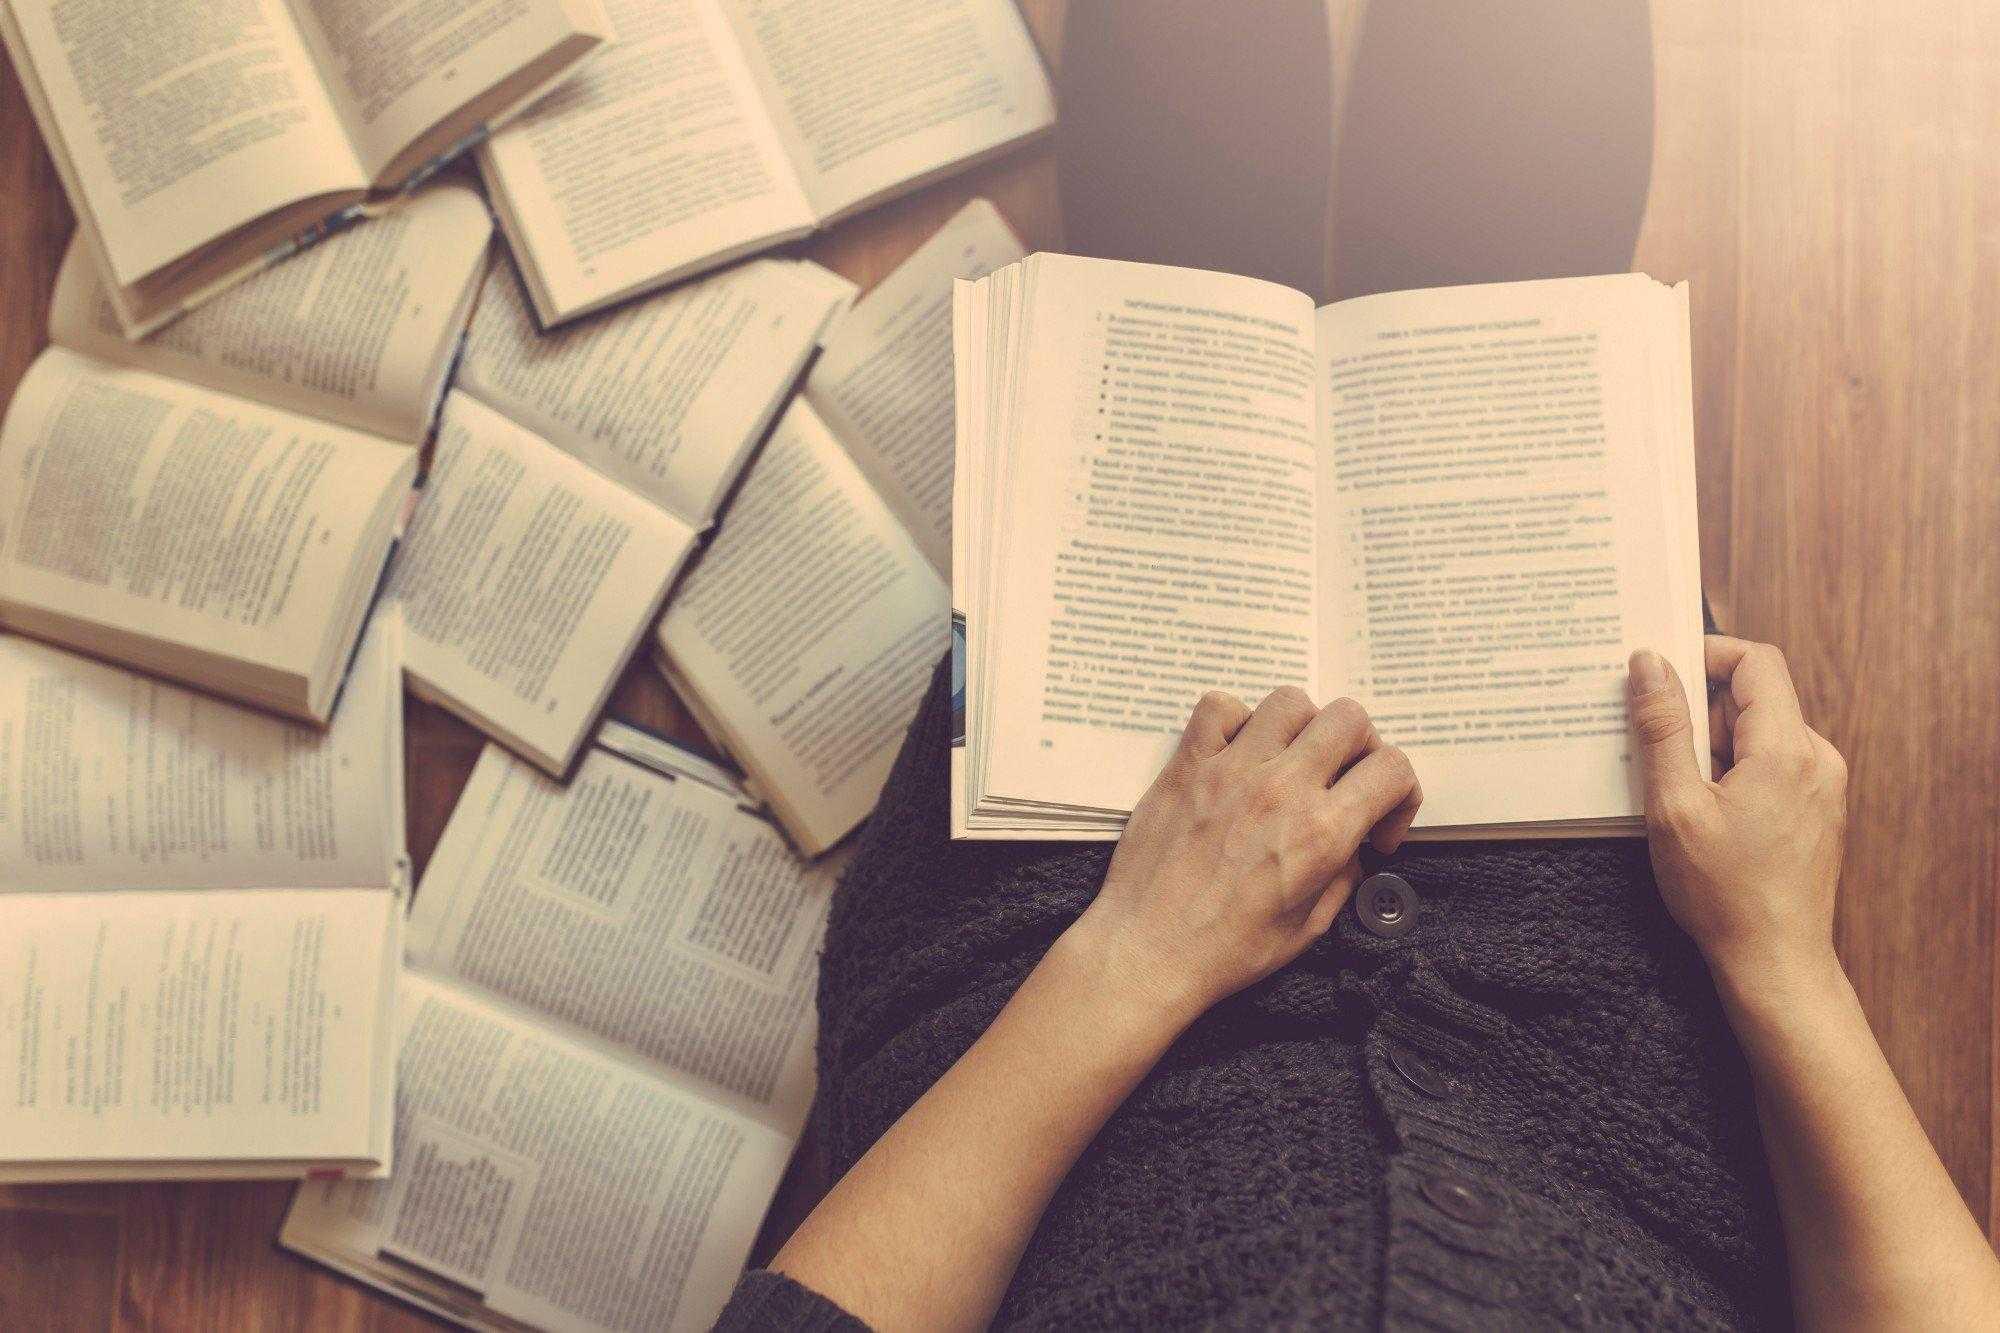 I 15 (e passa) libri che ogni aspirante leader dovrebbe leggere